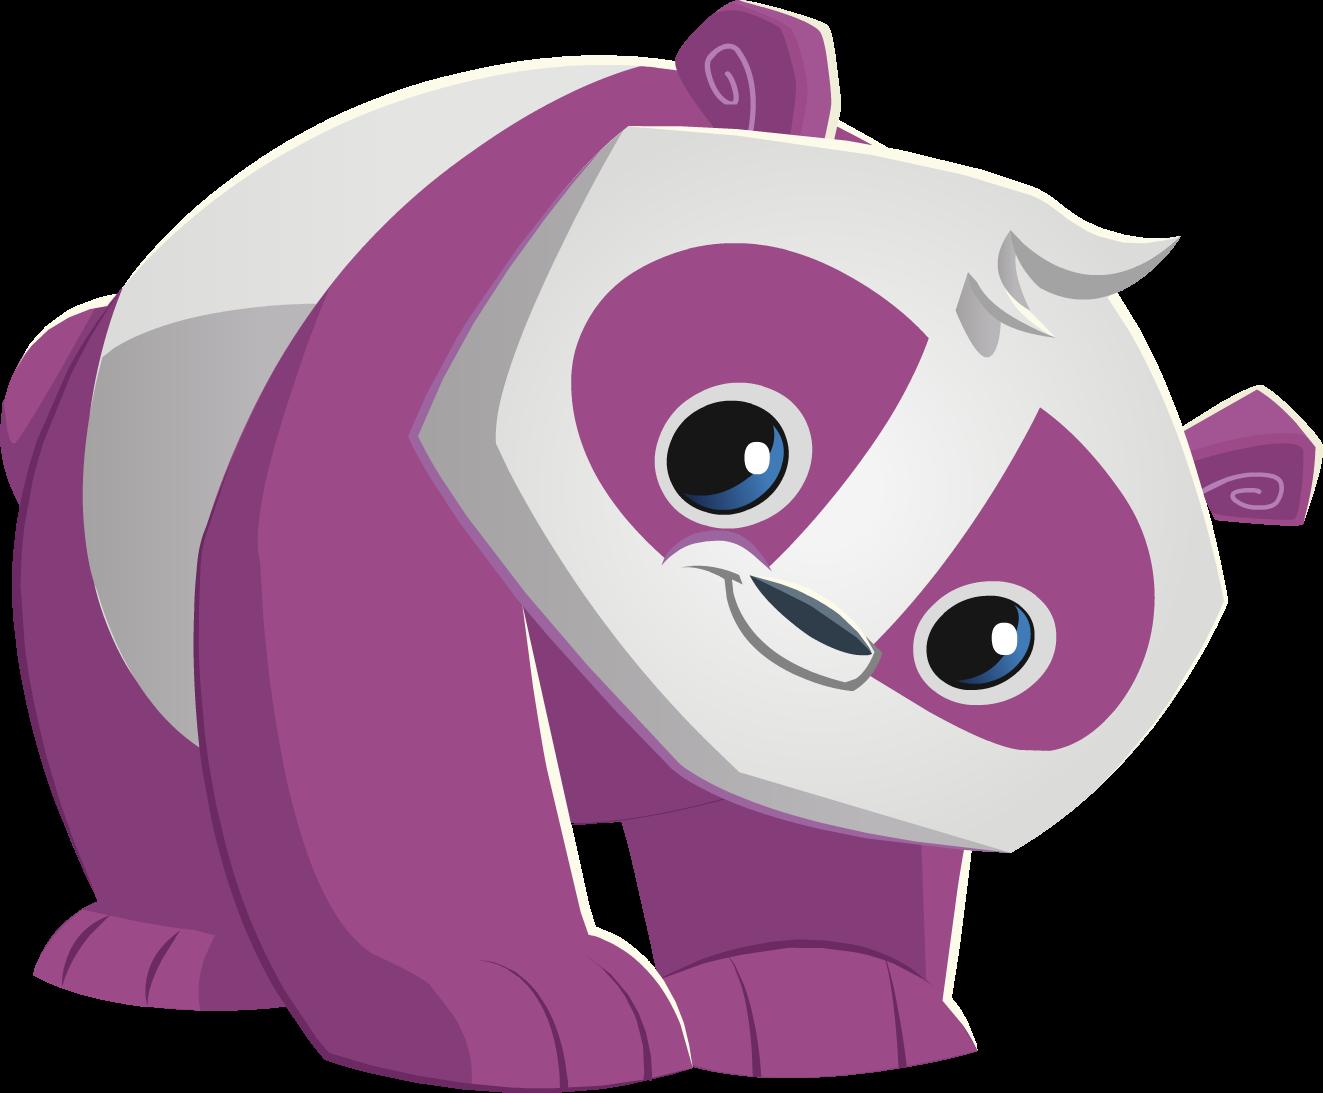 Image purple panda png. Cougar clipart animal jam